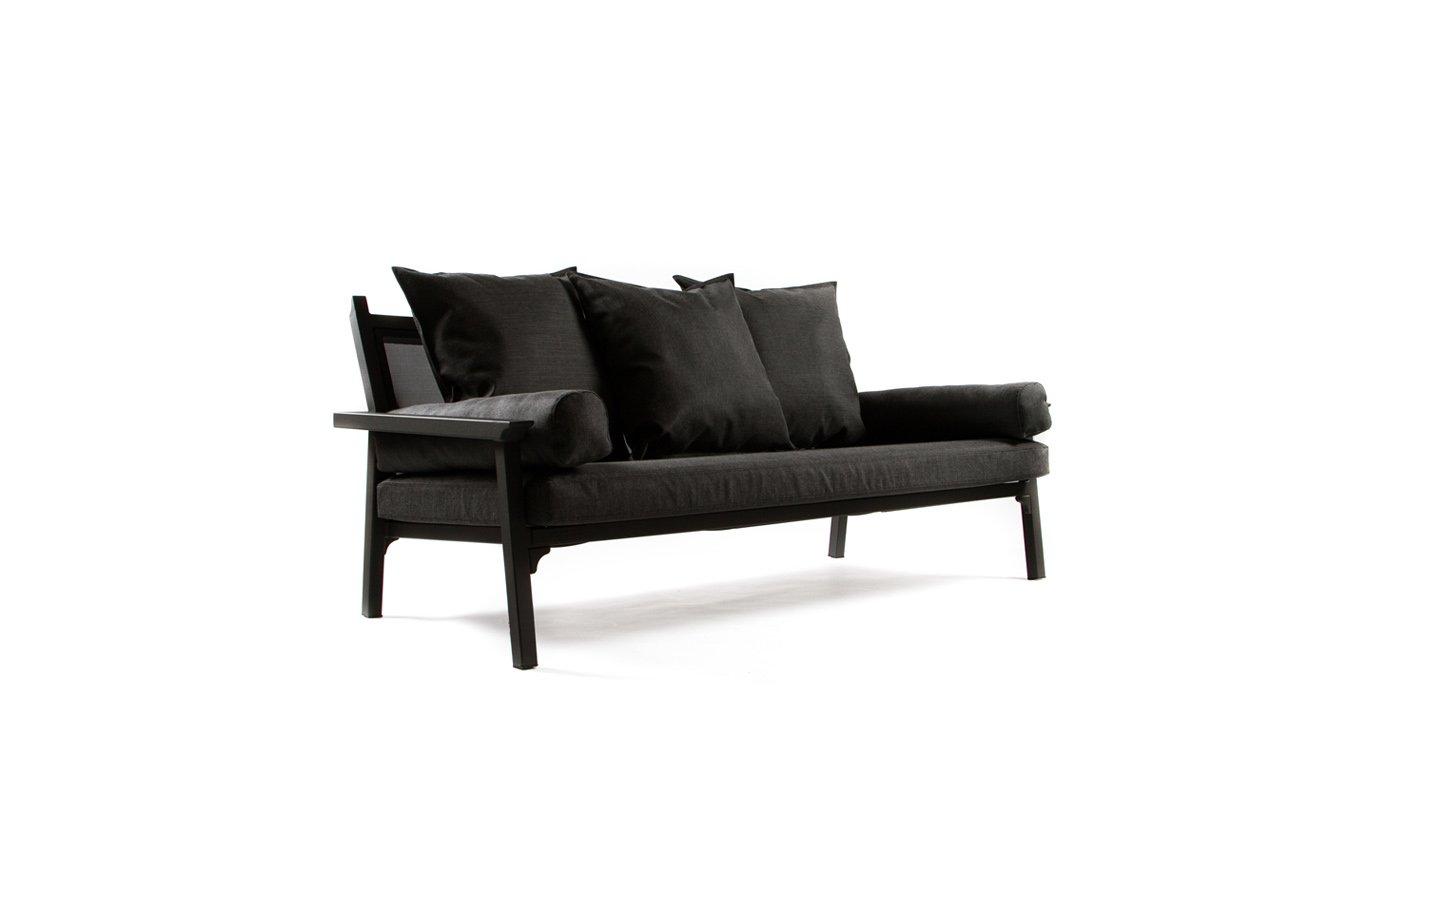 online sofa set in dubai cushions for bed classique three seater fabiia uae